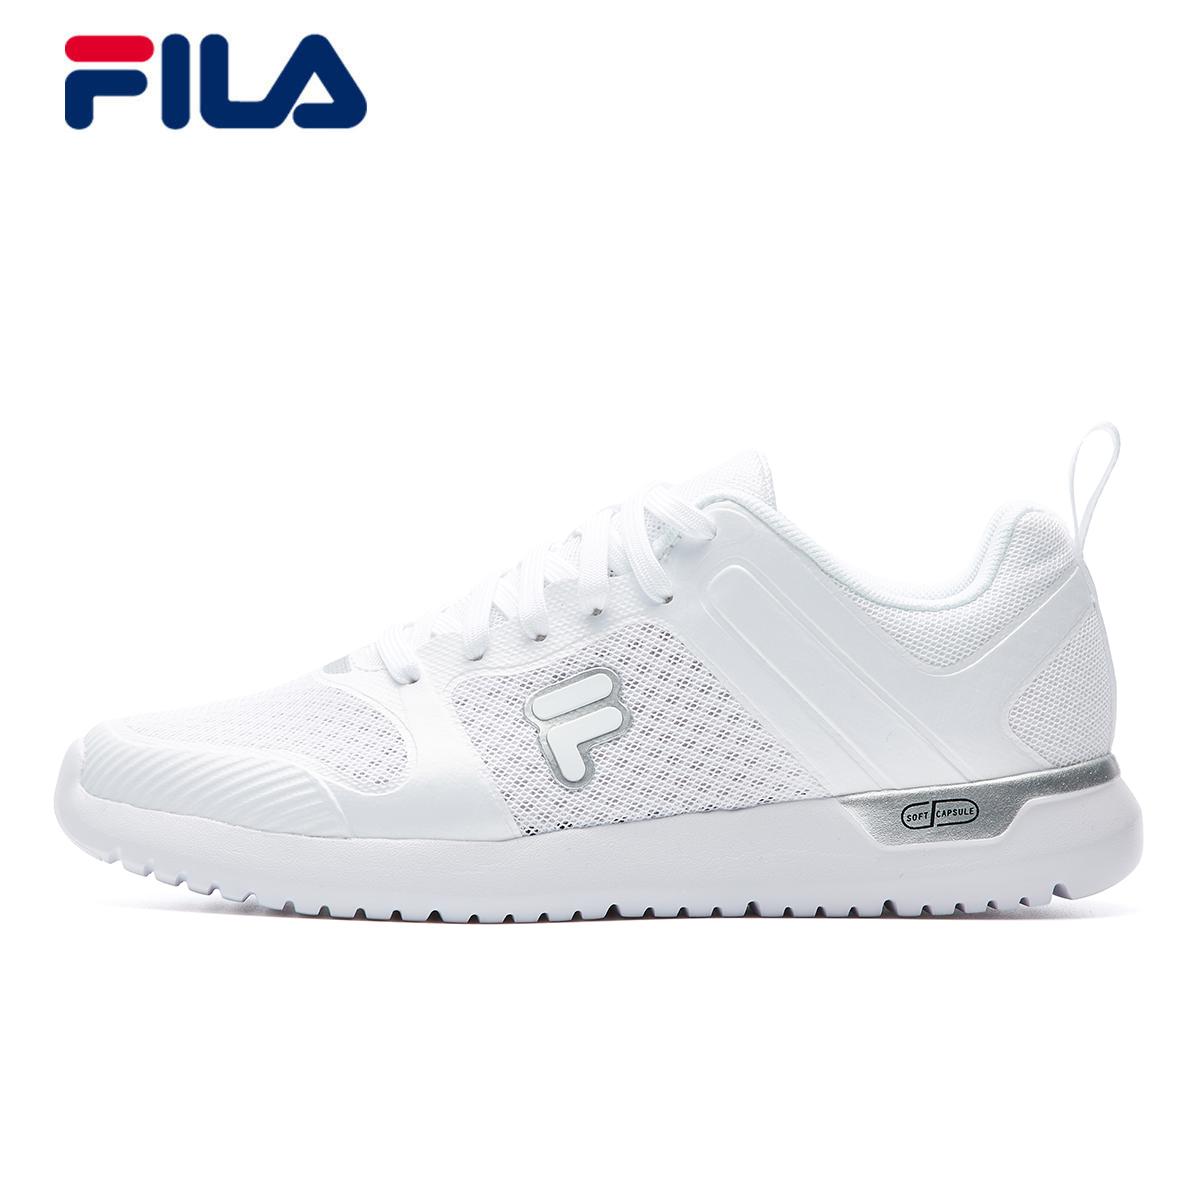 fila soft capsule shoes price